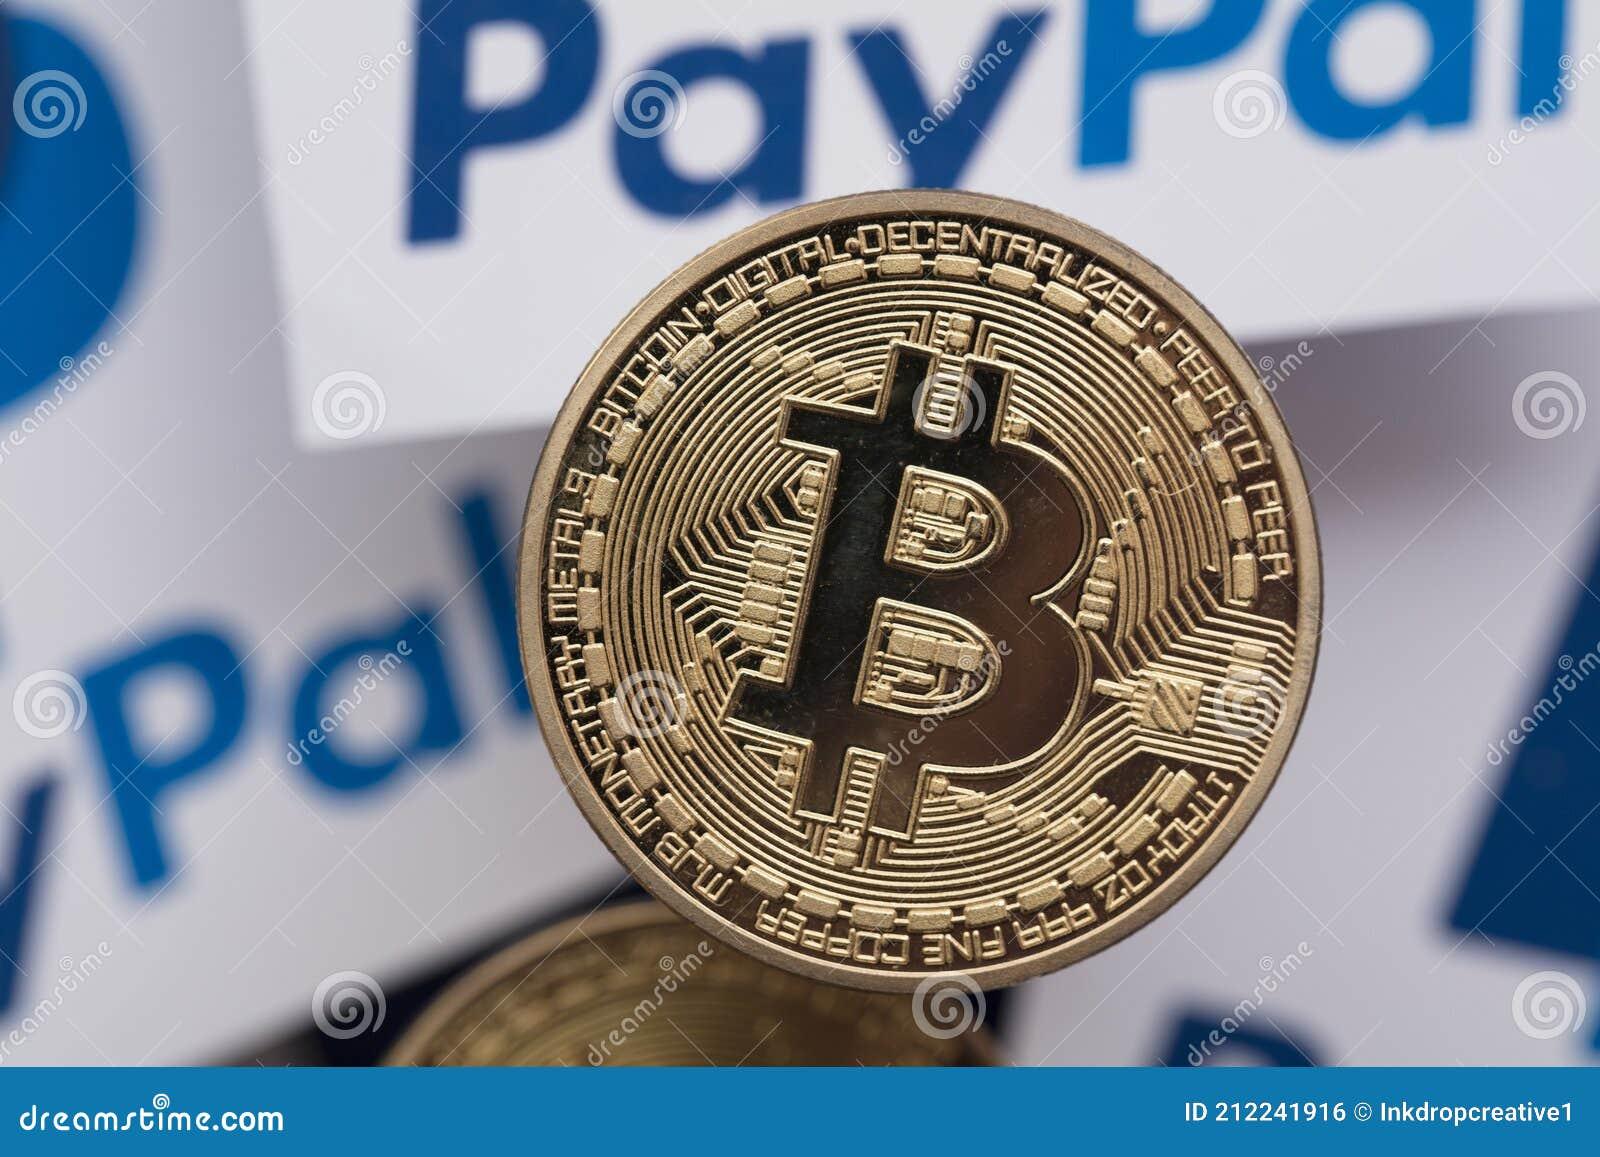 paypal a bitcoin filippine